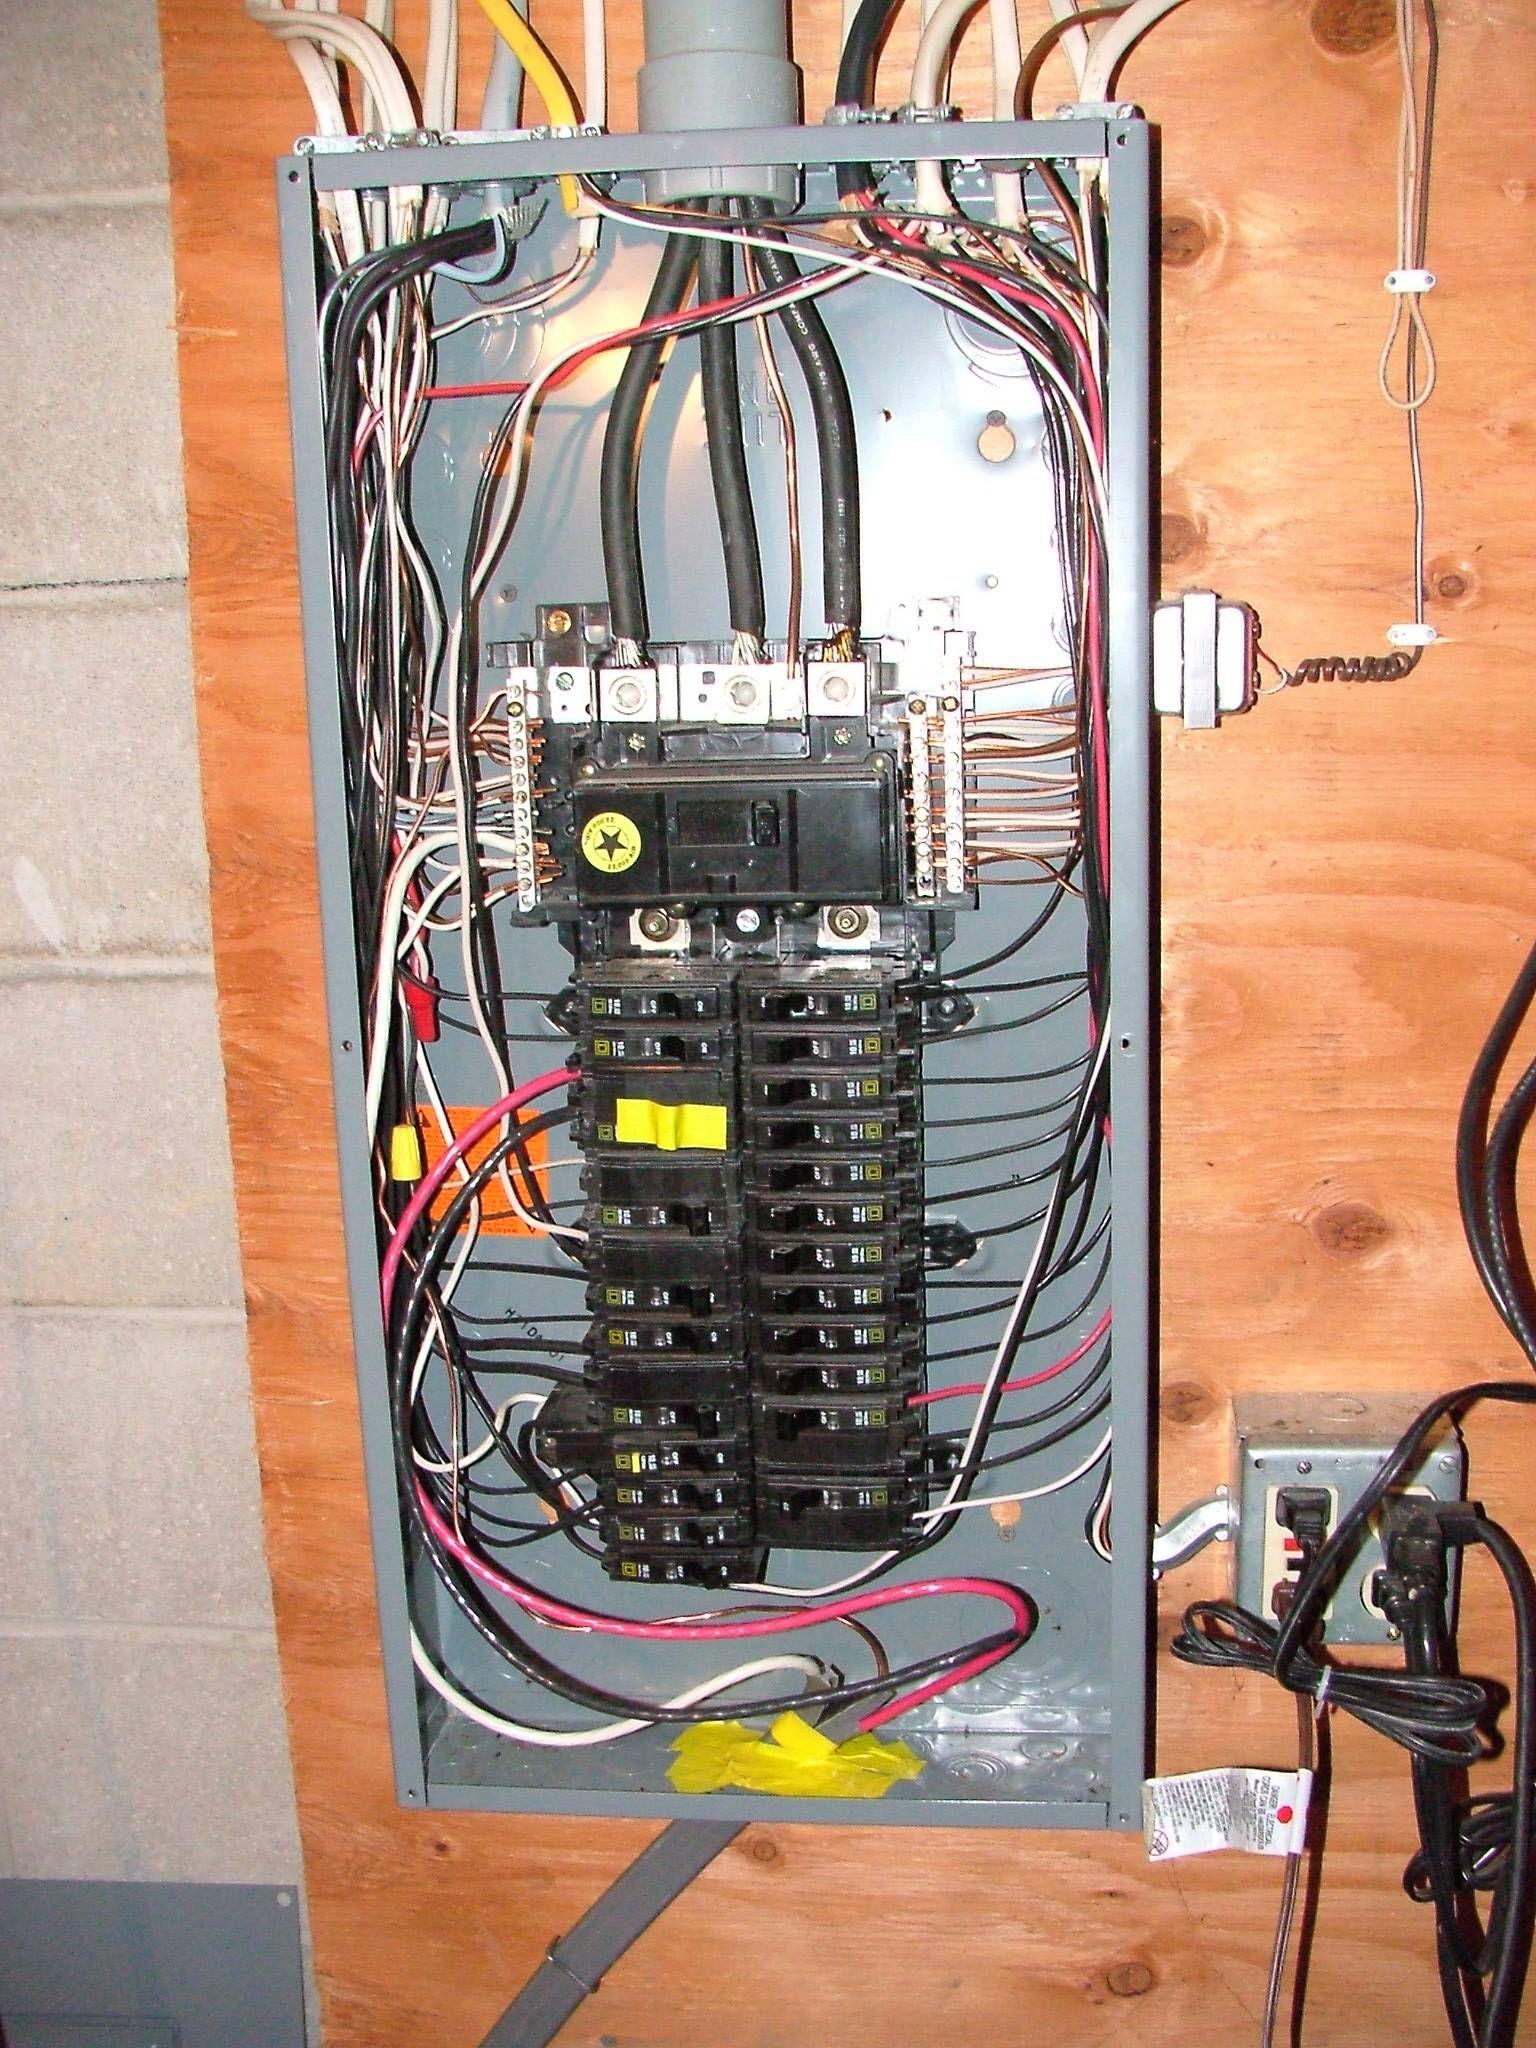 a quad electrical schematic wiring